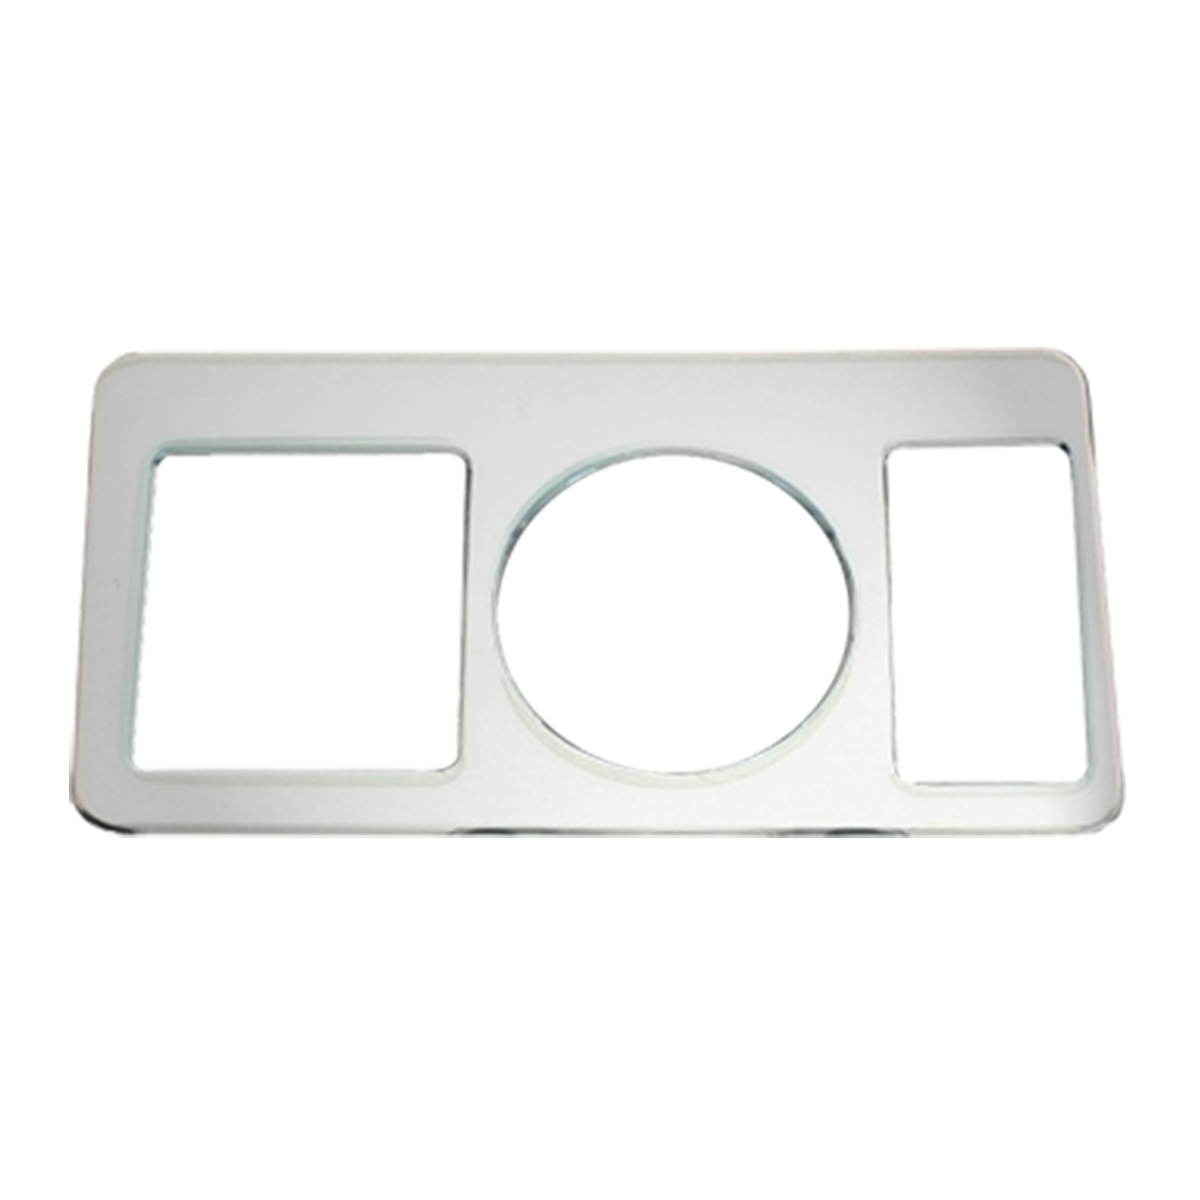 68917 KW Chrome Soft Plastic Left Control Trim